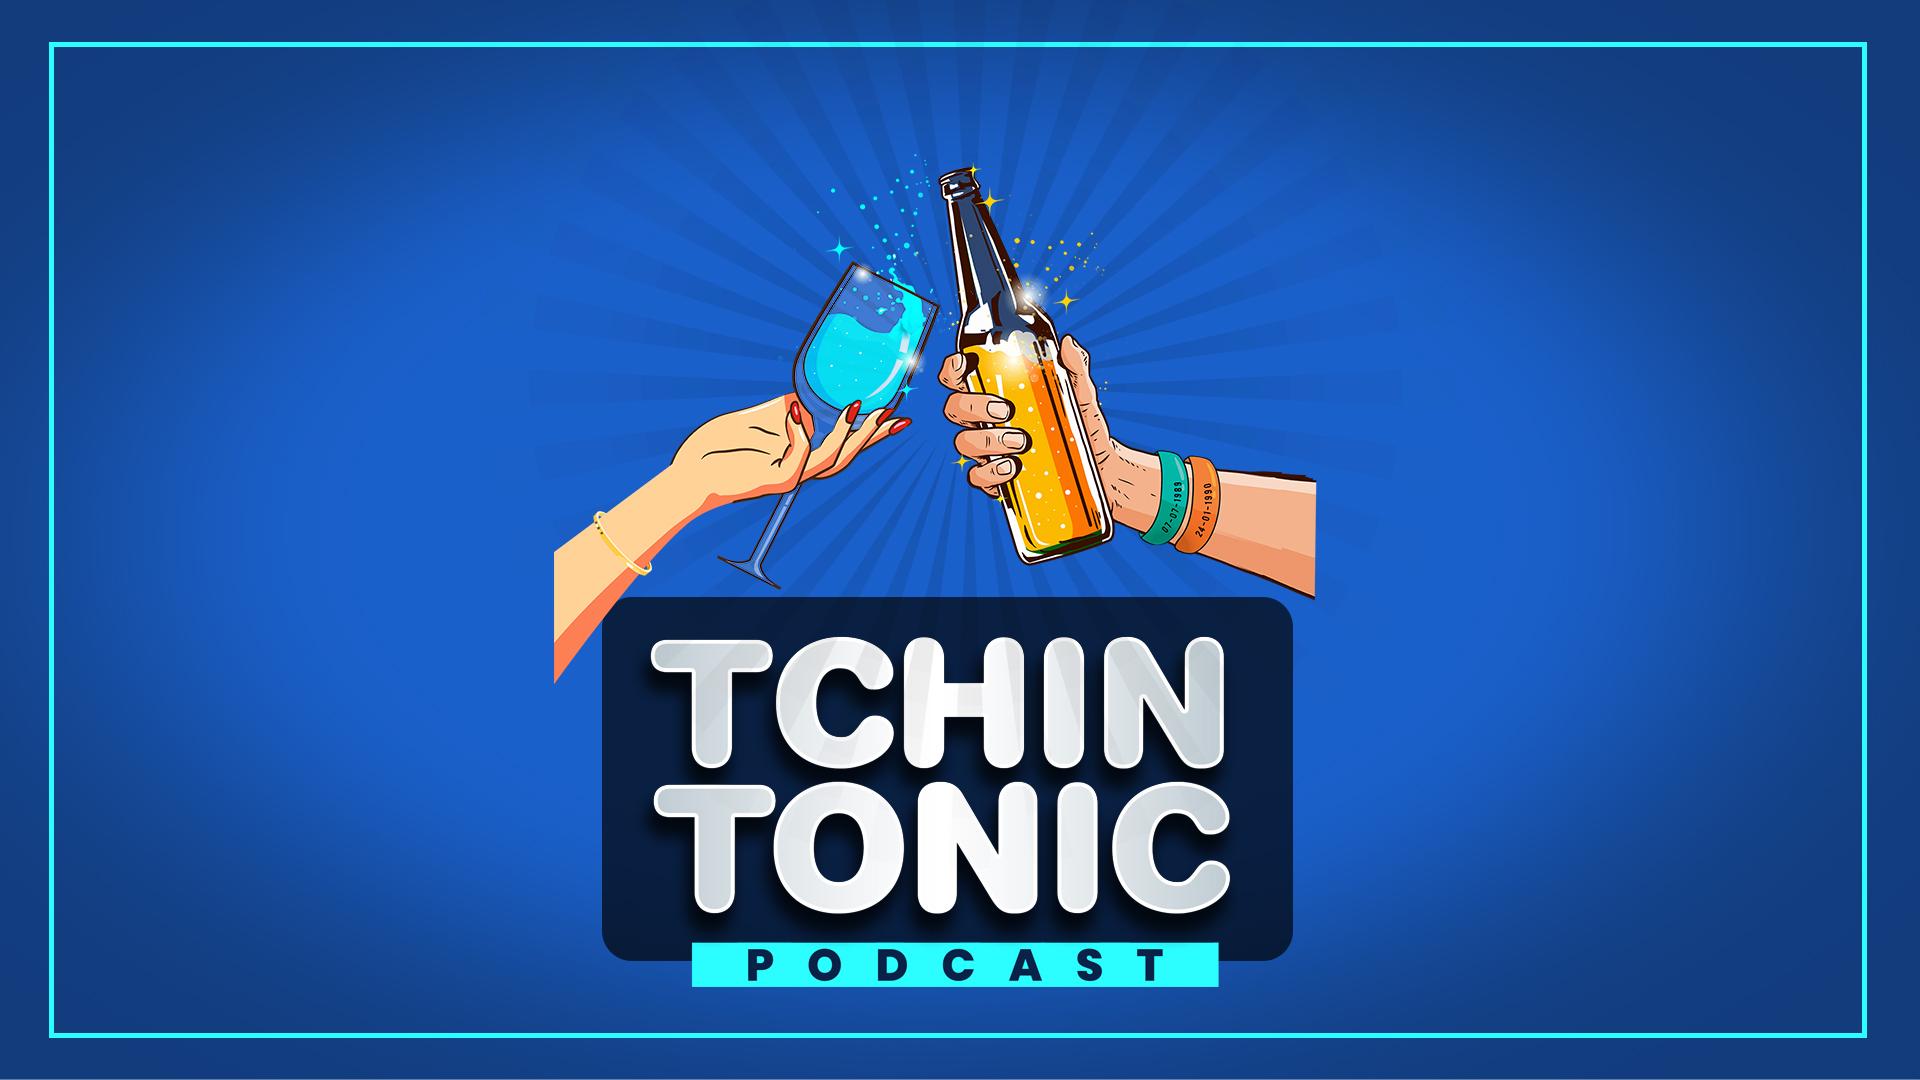 Tchin Tonic